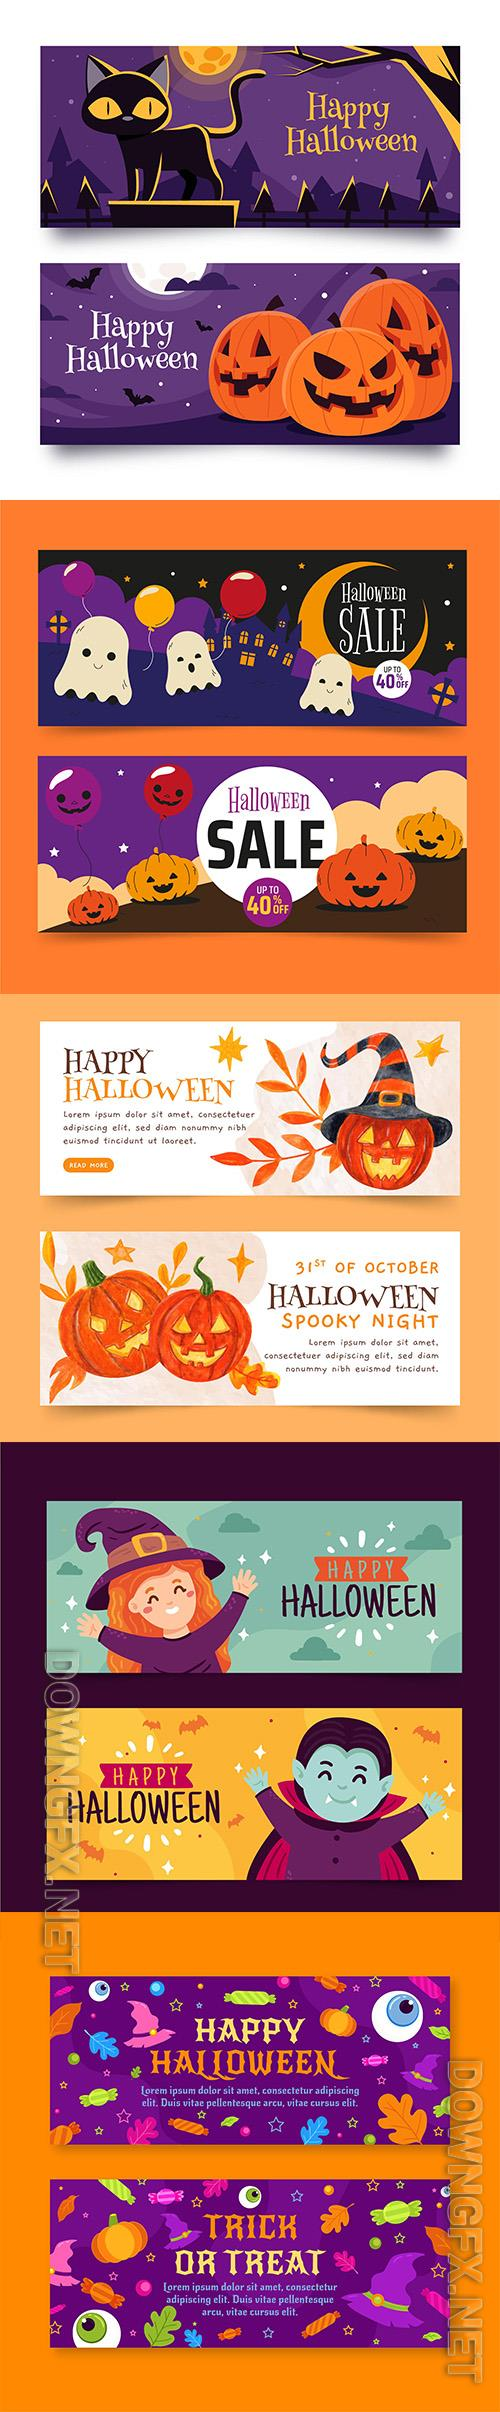 Halloween horizontal banners set vol3